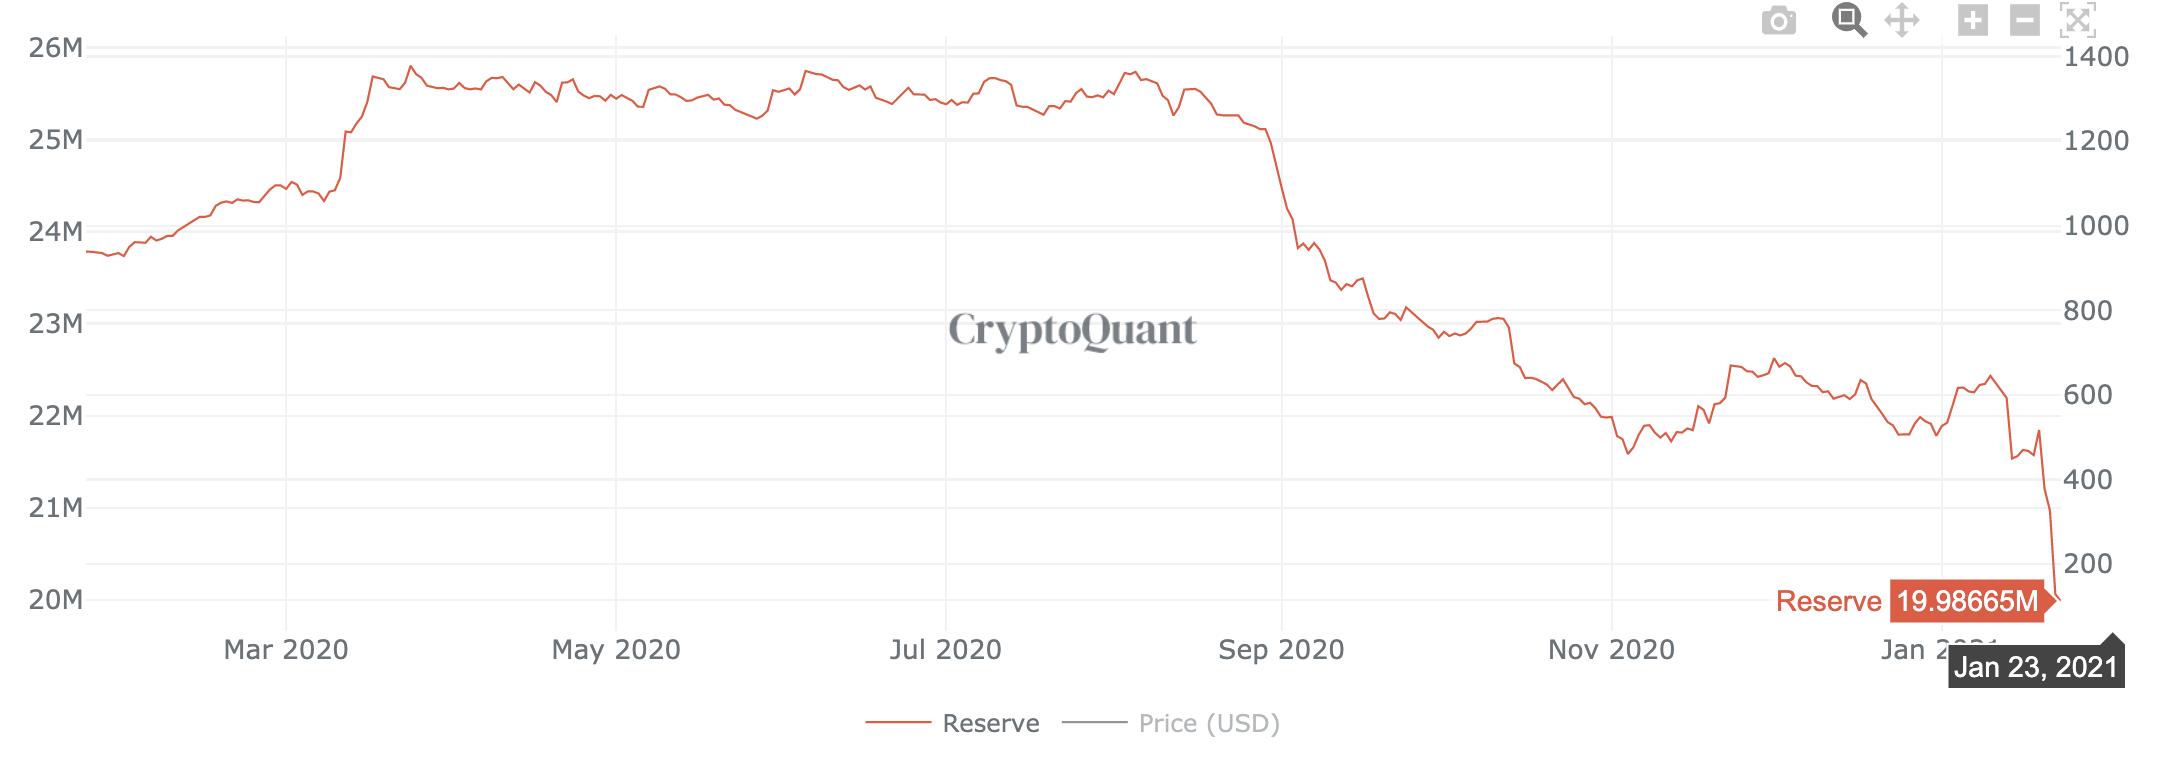 Eth reserves on exchanges, Jan 2021